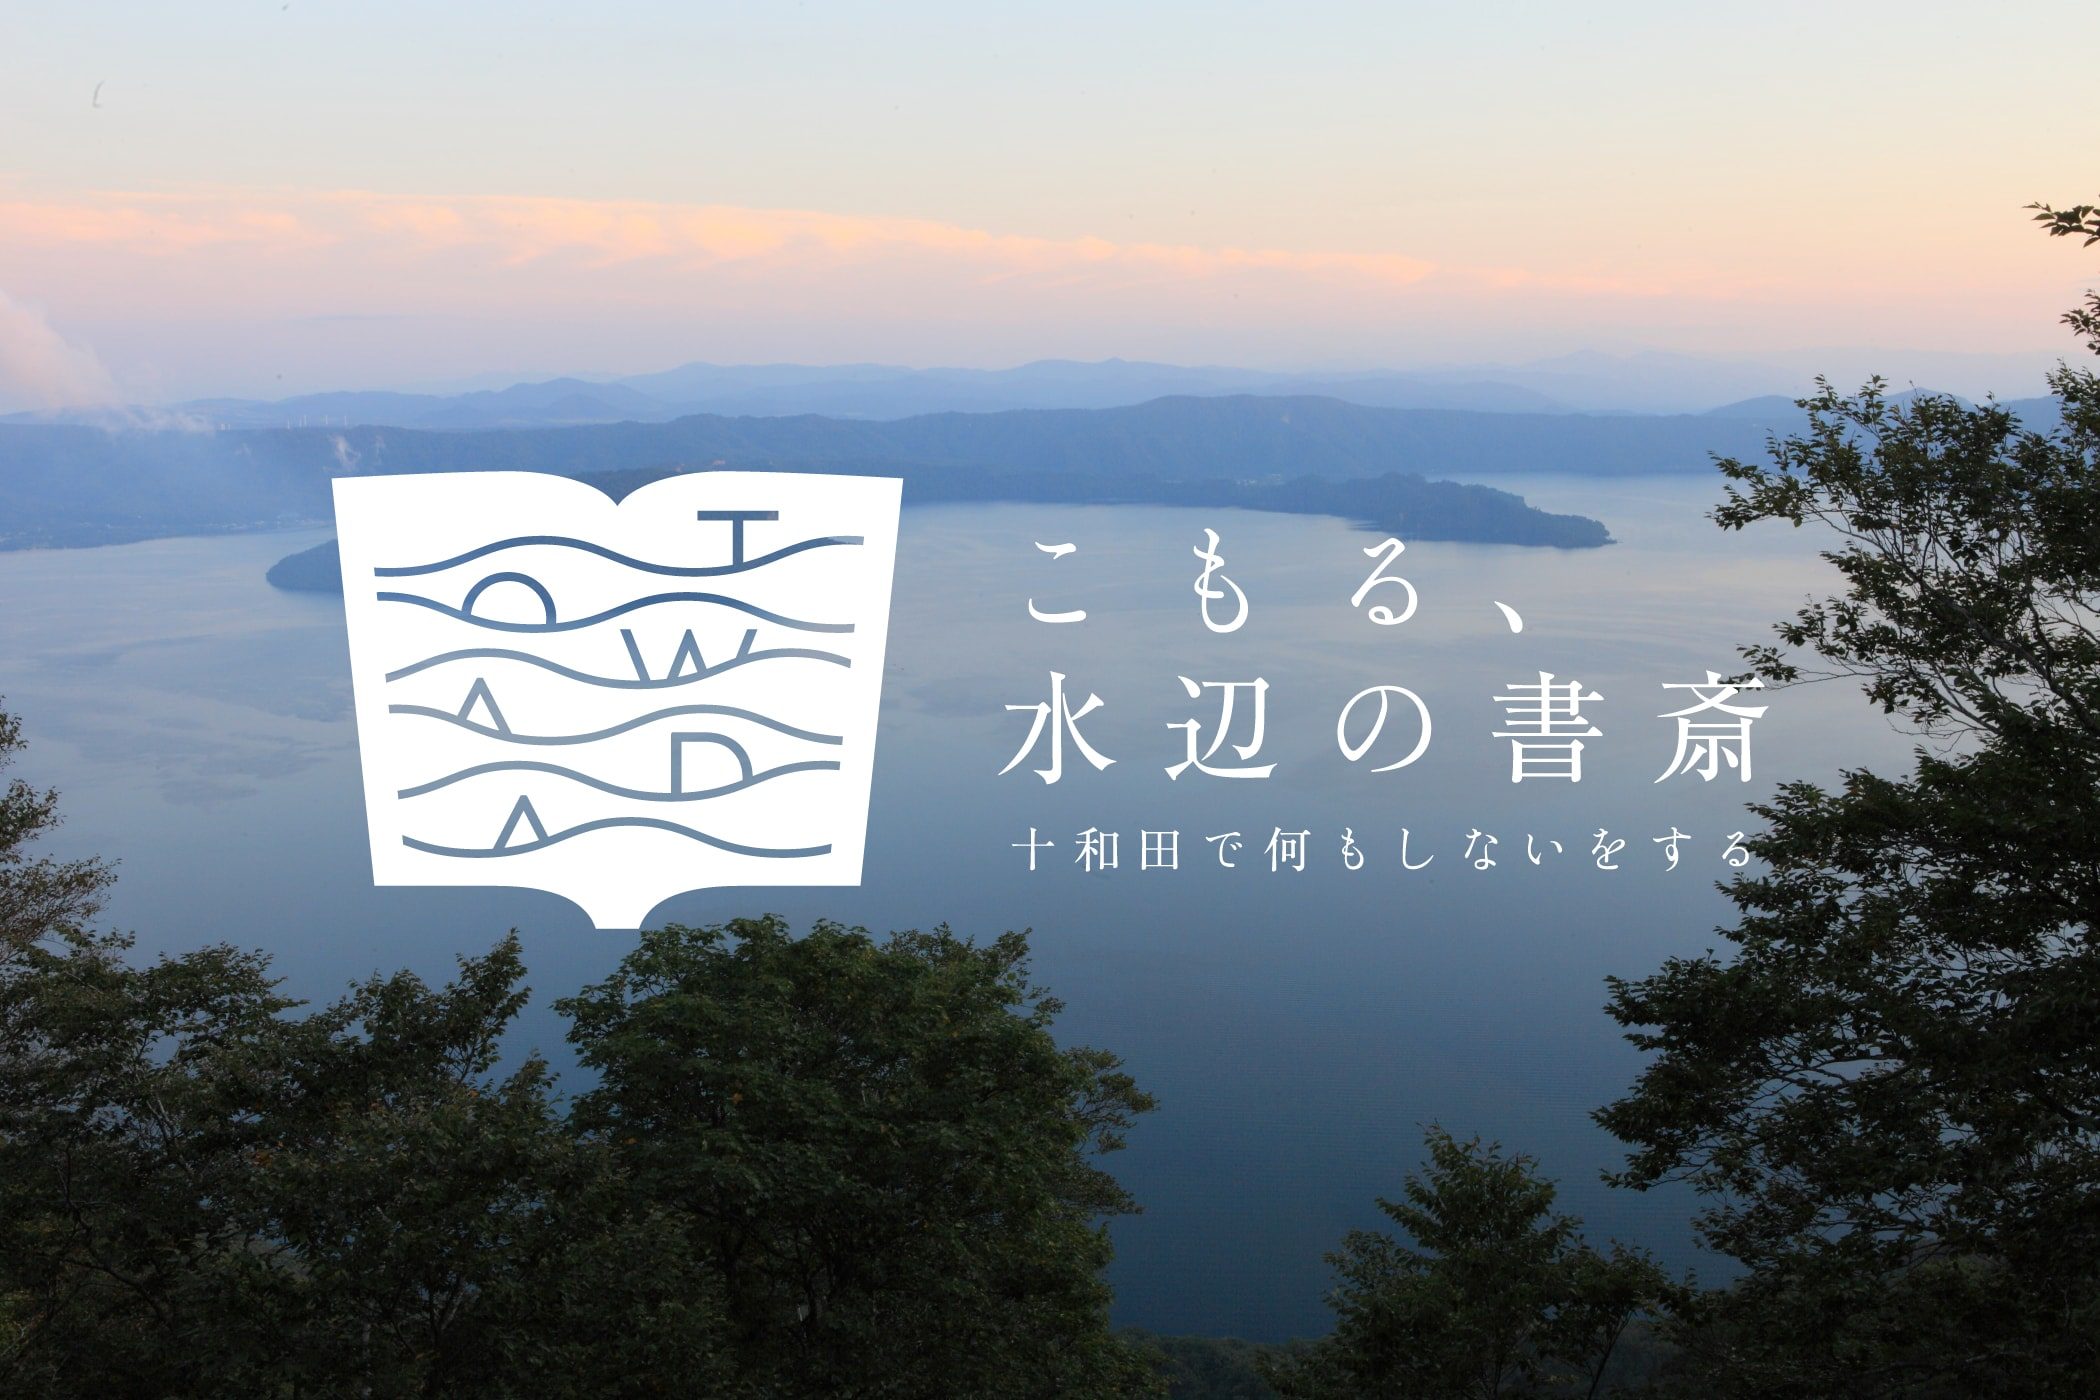 A01御鼻部山0001s-min copy (2019-08-09)-min.jpg